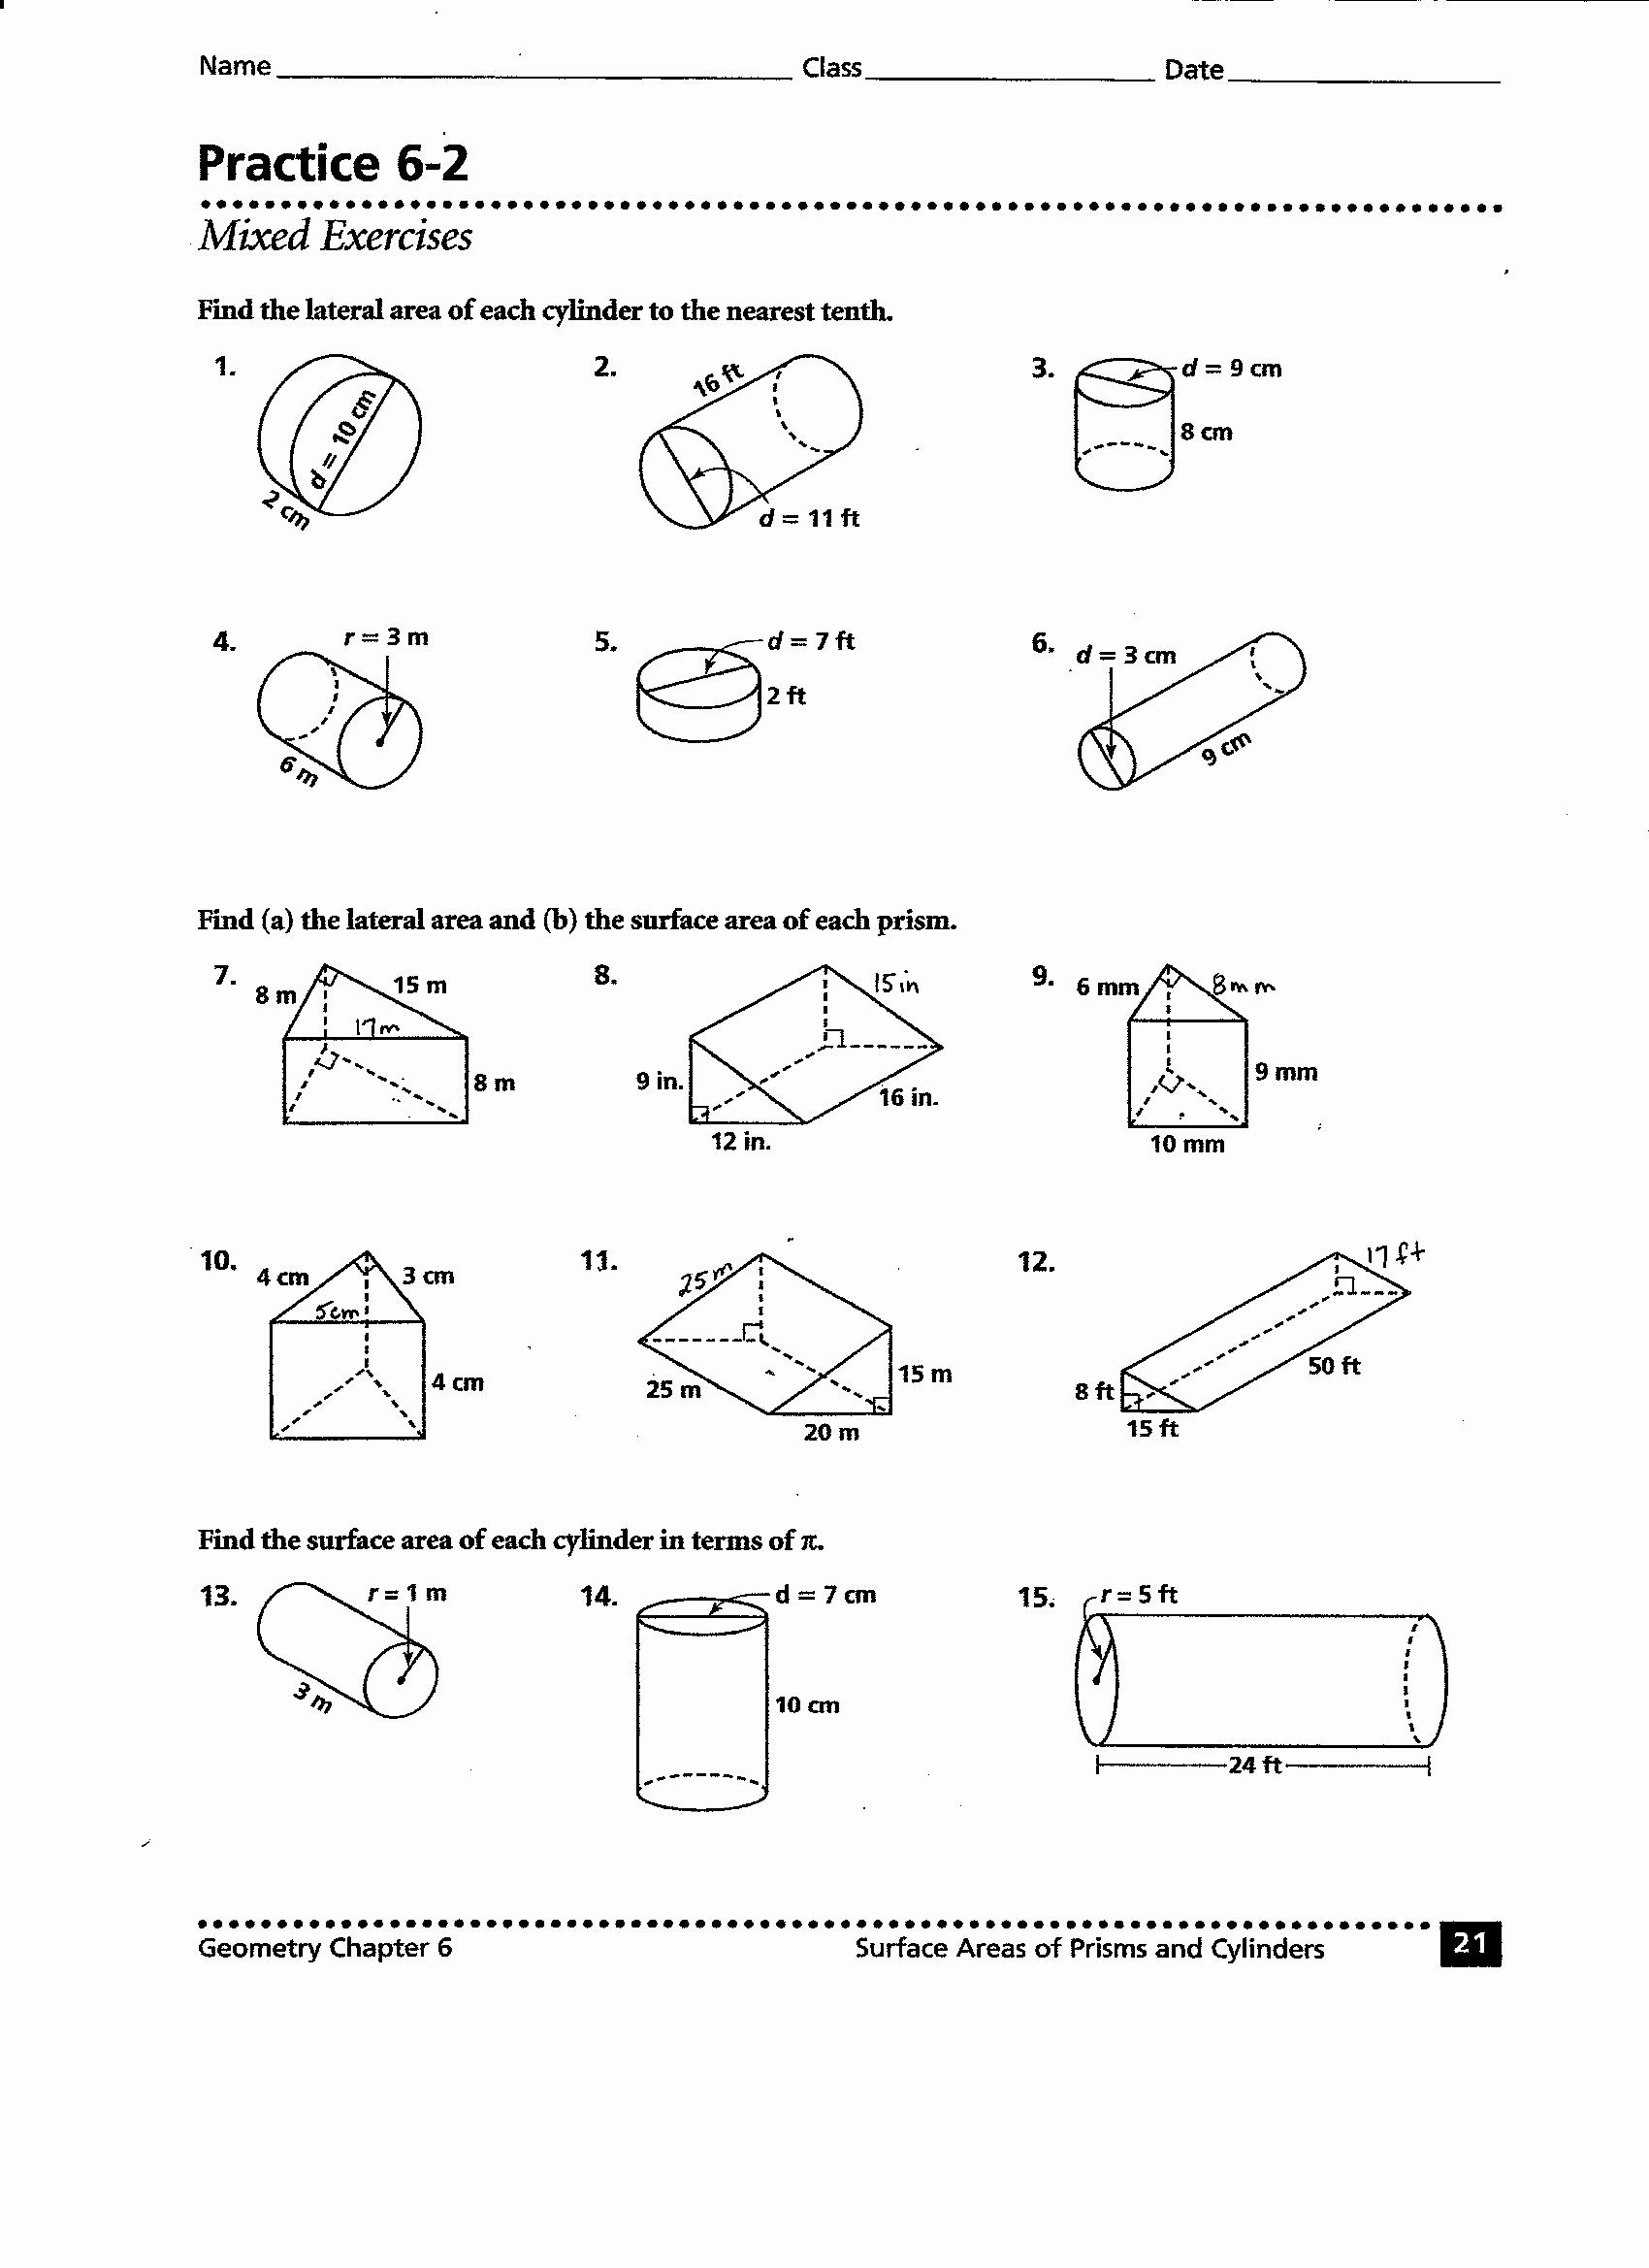 Volume Of Cylinders Worksheet Beautiful 41 Volume Prisms and Cylinders Worksheet Quiz